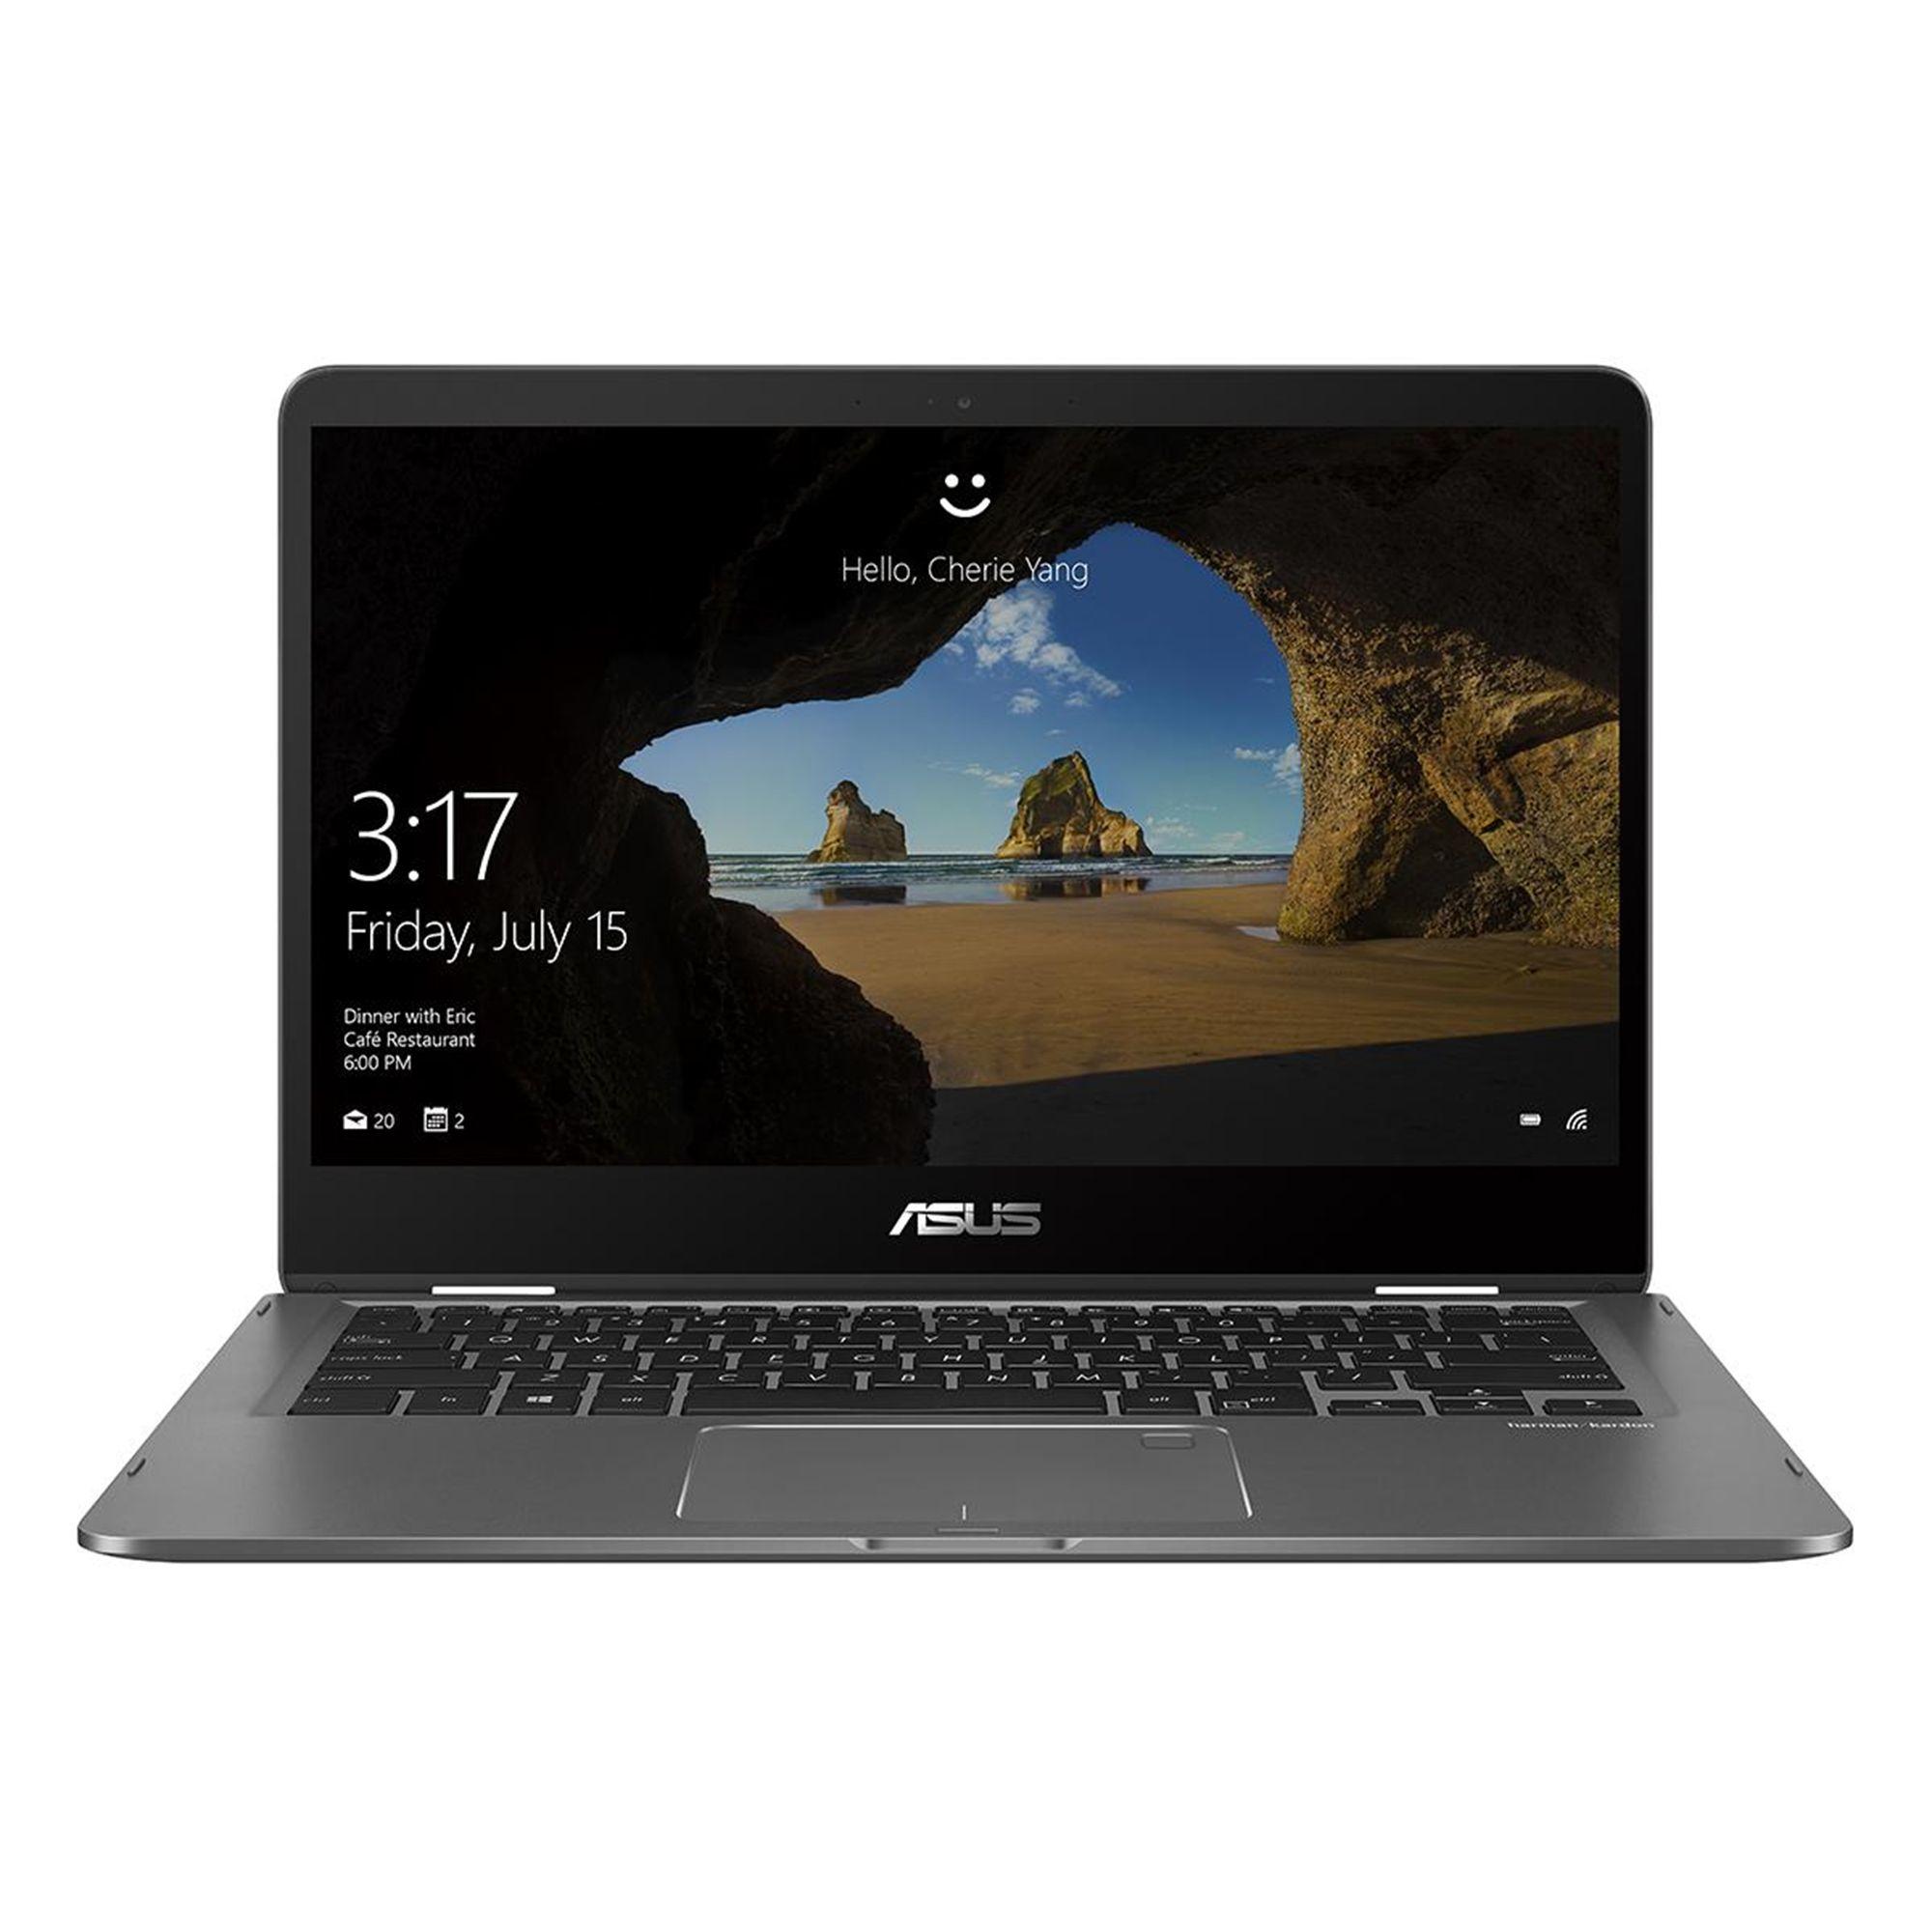 Ultrabook Asus ZenBook UX461UA 14 Full HD Touch Intel Core i7-8550U RAM 8GB SSD 512GB Windows 10 Pro Gri